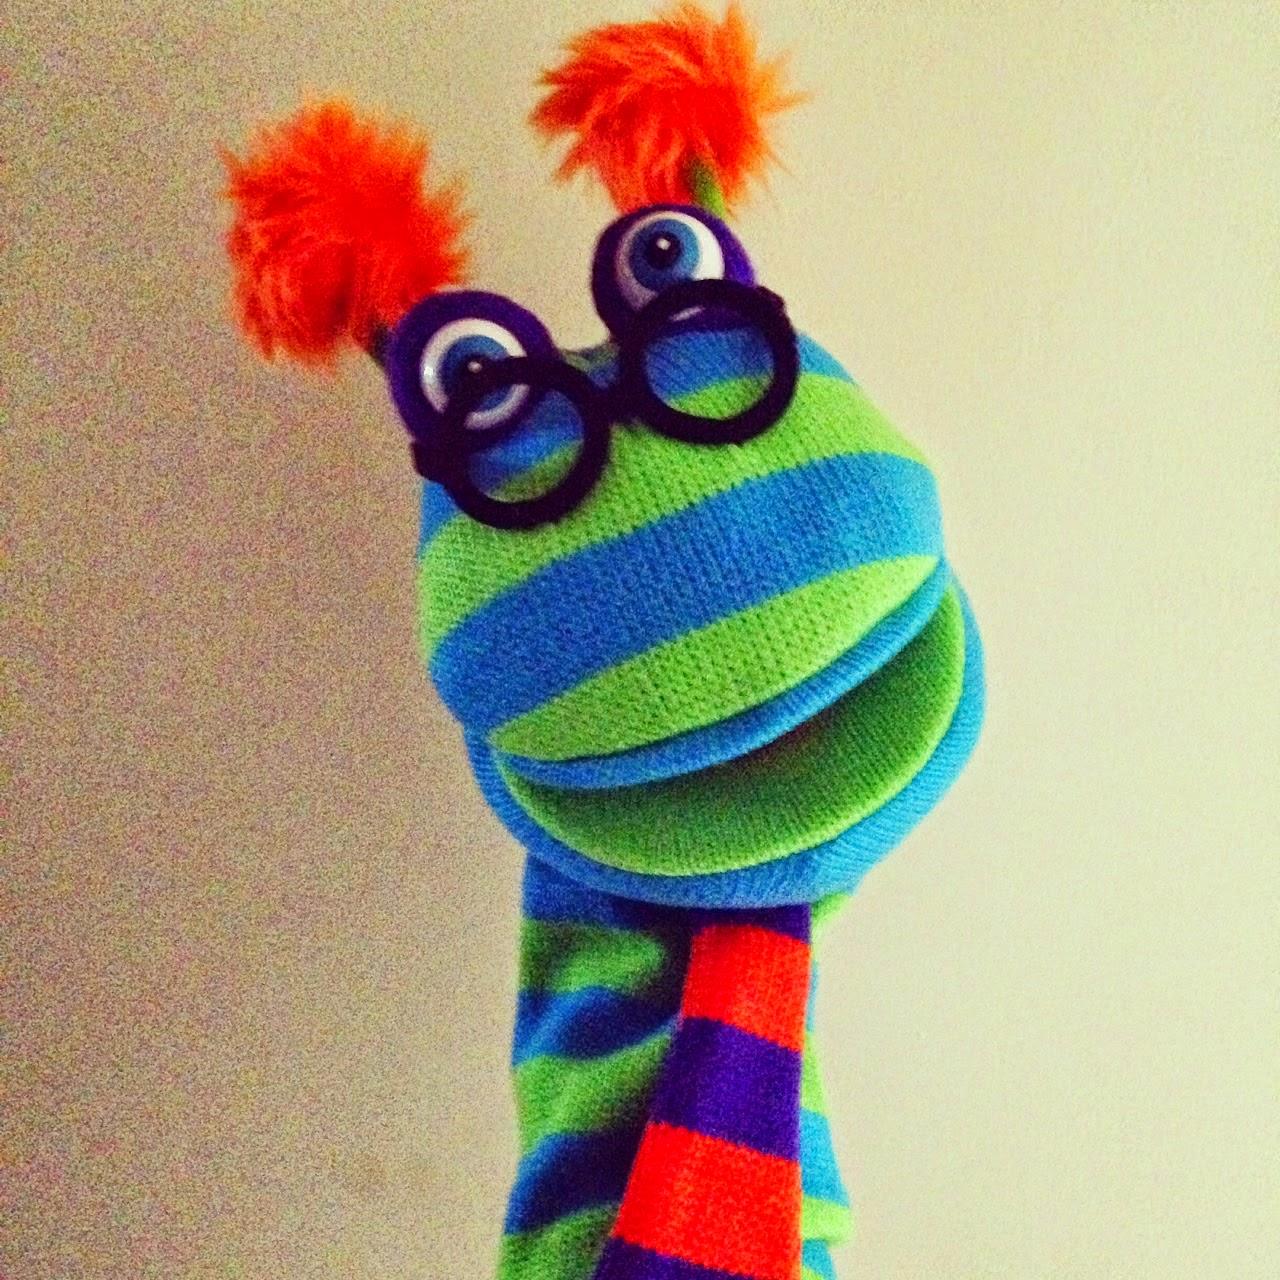 http://spanishwithmisscarolina.blogspot.co.uk/2015/04/el-uso-de-marionetas-en-la-clase-de-ele.html